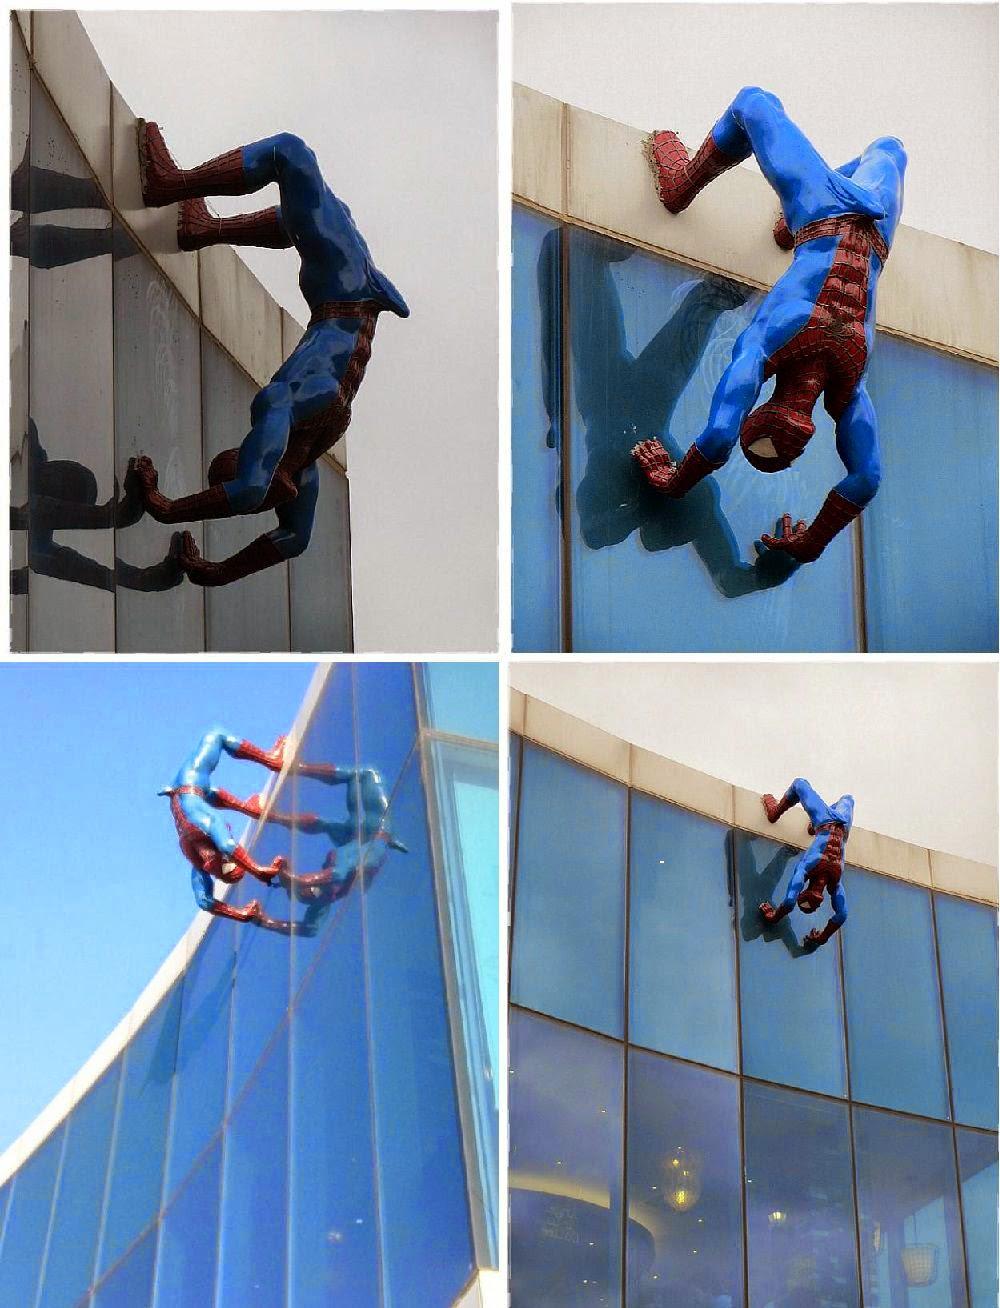 Spiderman Erection